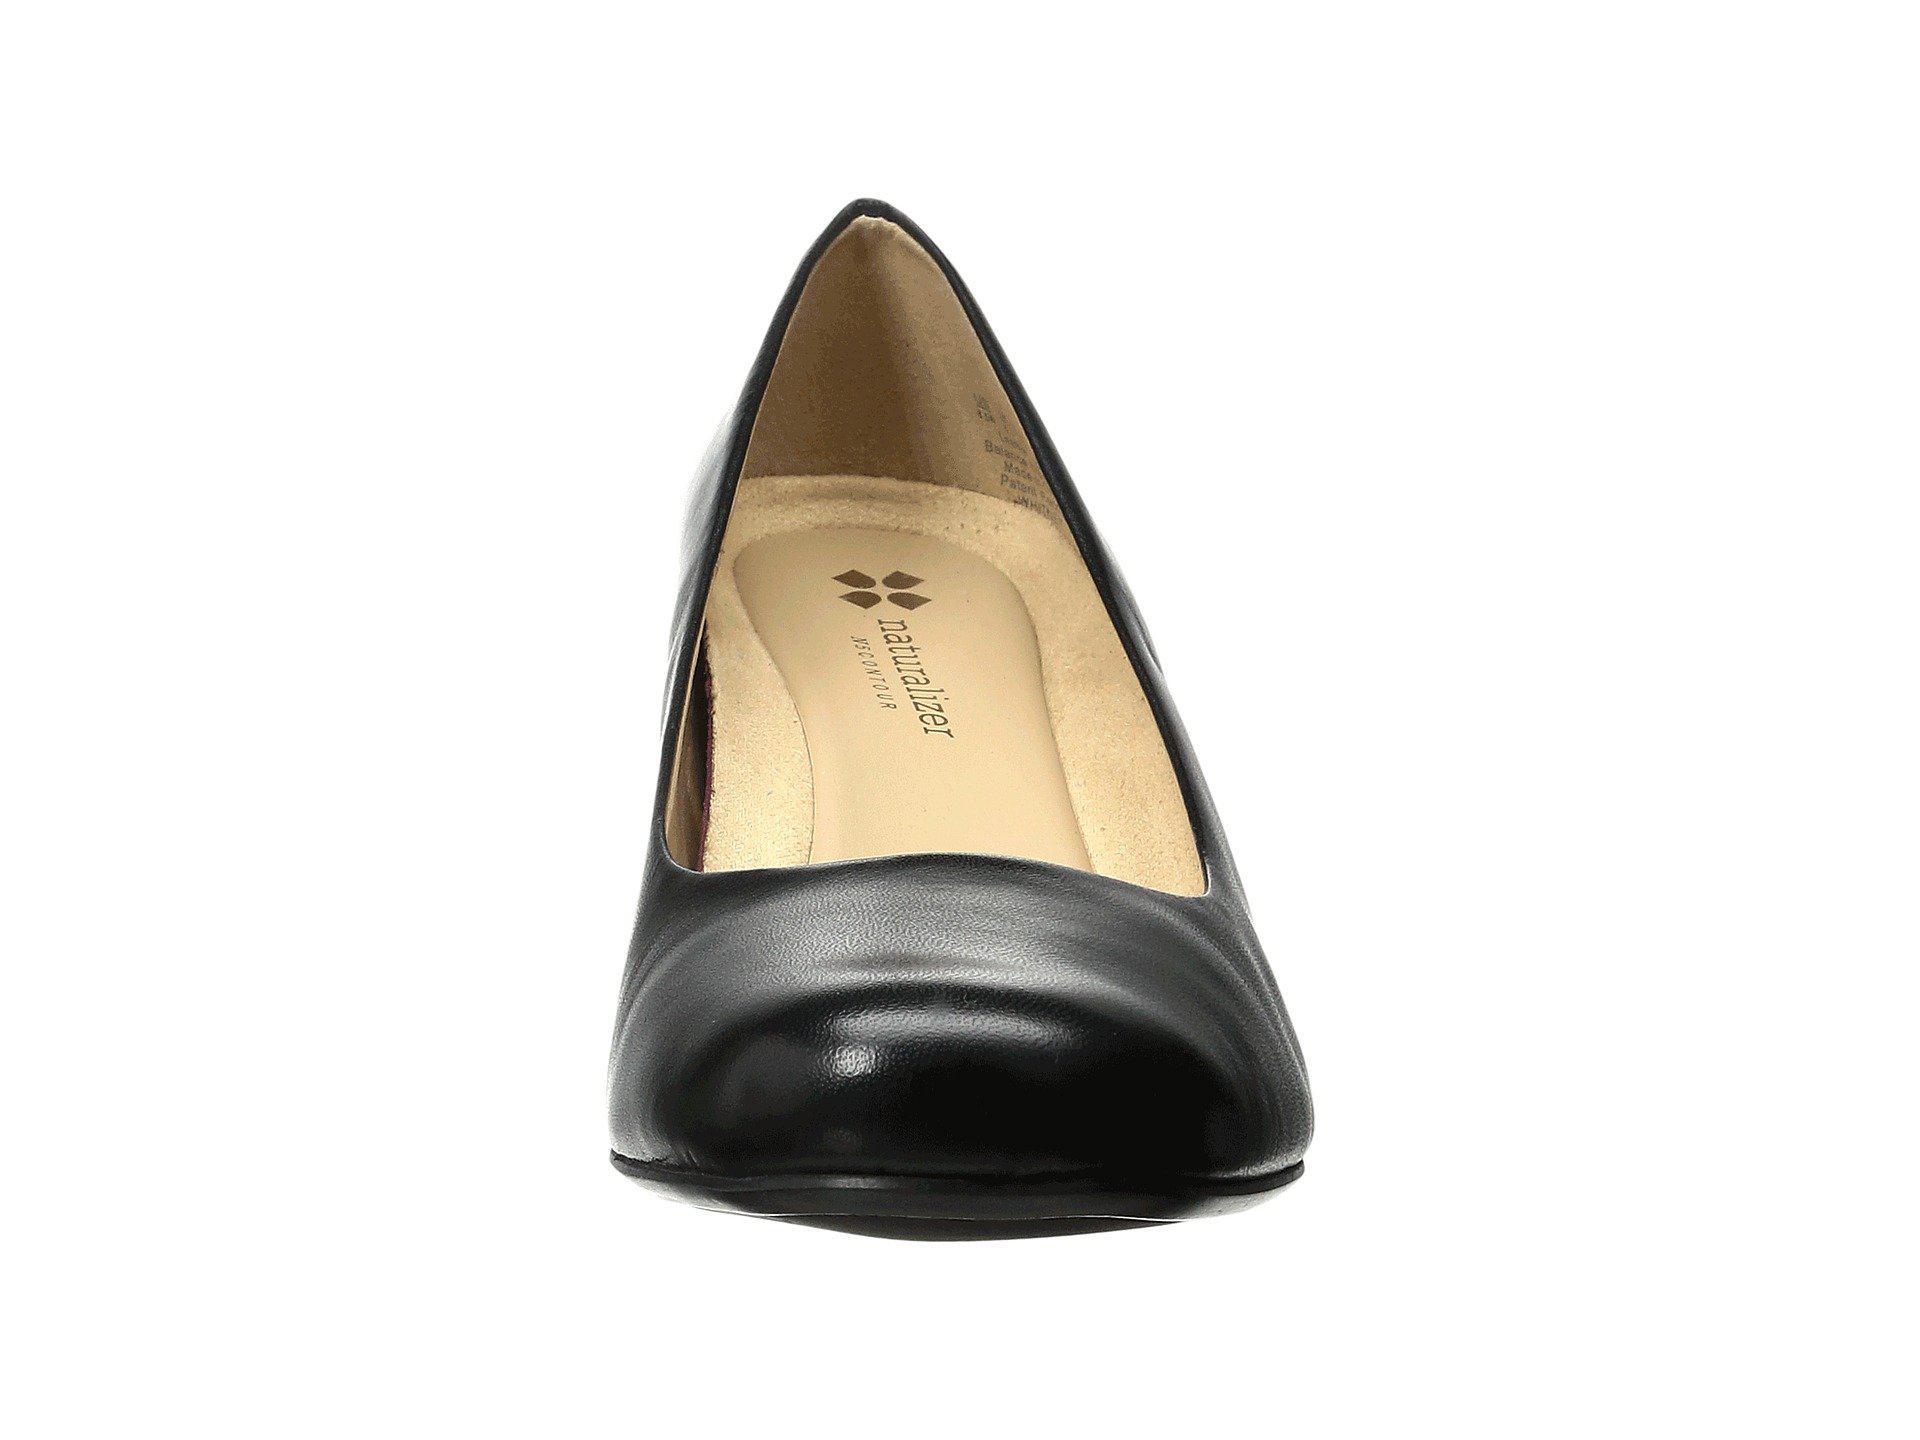 fae18c1834b6 Naturalizer - Whitney (black Patent Leather) High Heels - Lyst. View  fullscreen